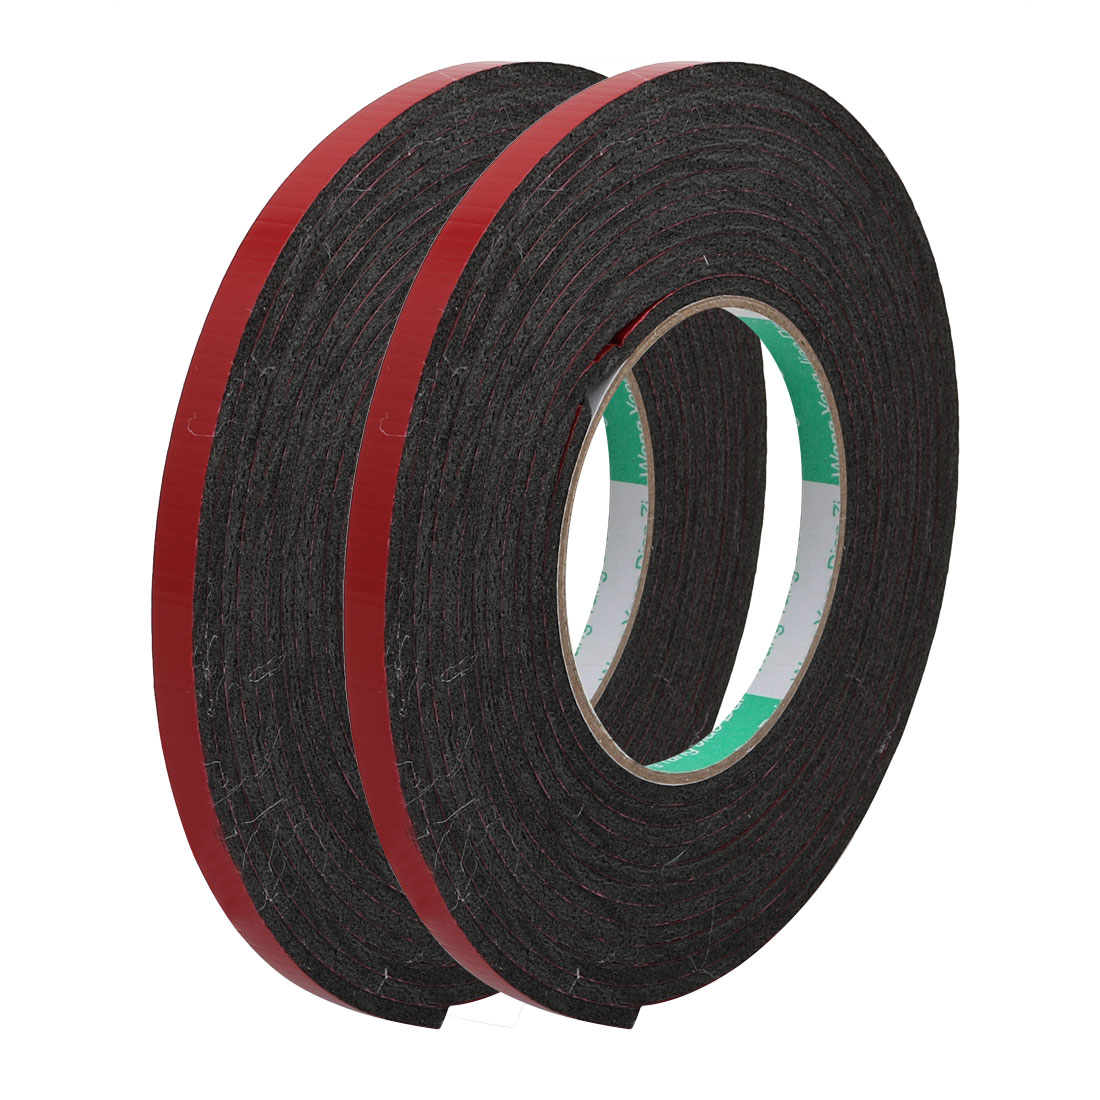 Unique Bargains 2pcs Door Seal 8x3mm Dual-sided Adhesive Shockproof Sponge Foam Tape 4M Length